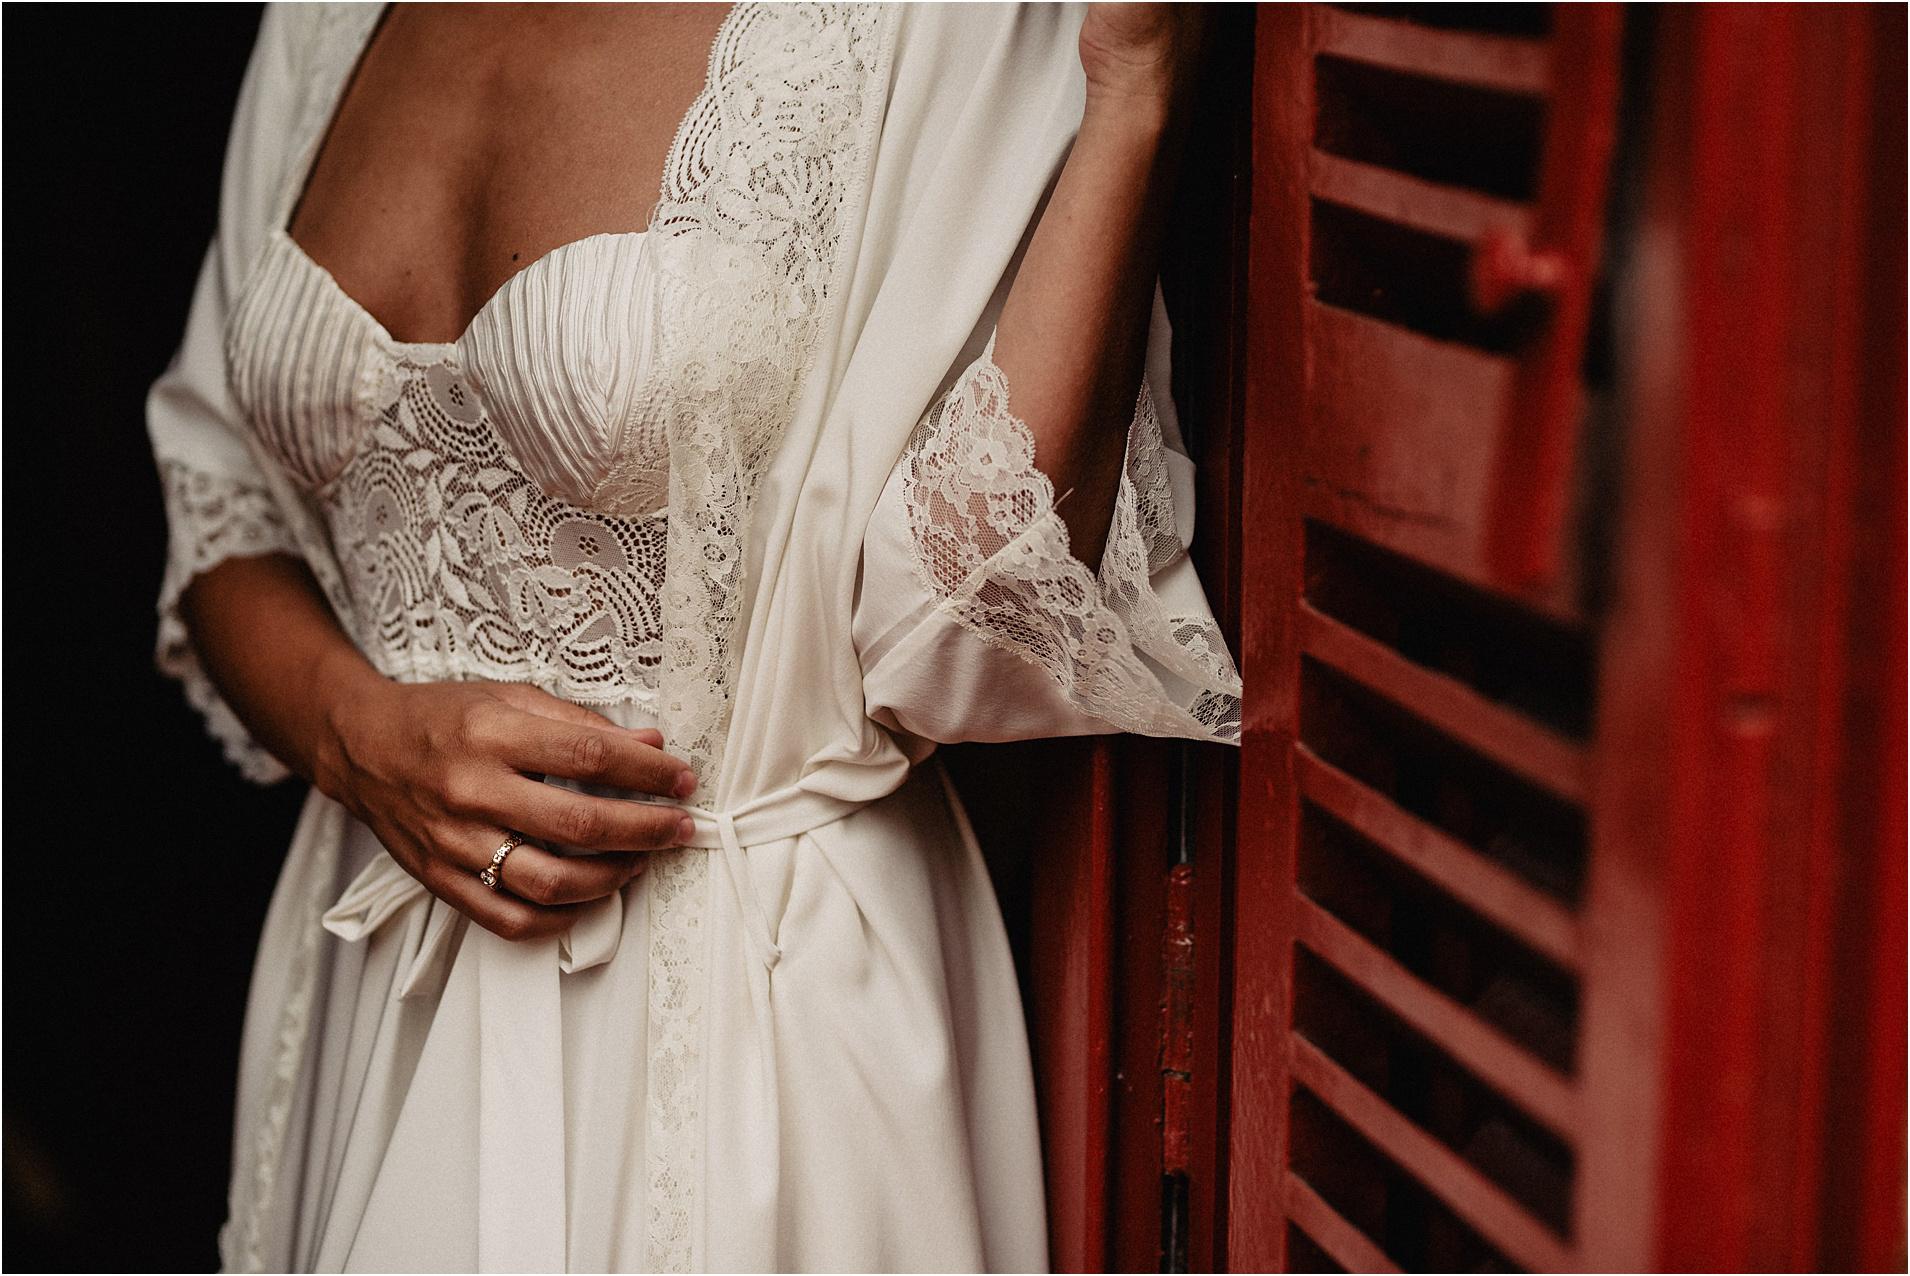 Fotografía y video en Palacio de Arbaisenea Bodas San Sebastián Donostia Guipuzcoa - Finca Arbaisenea by Maher Catering Wedding films and photography-30.jpg